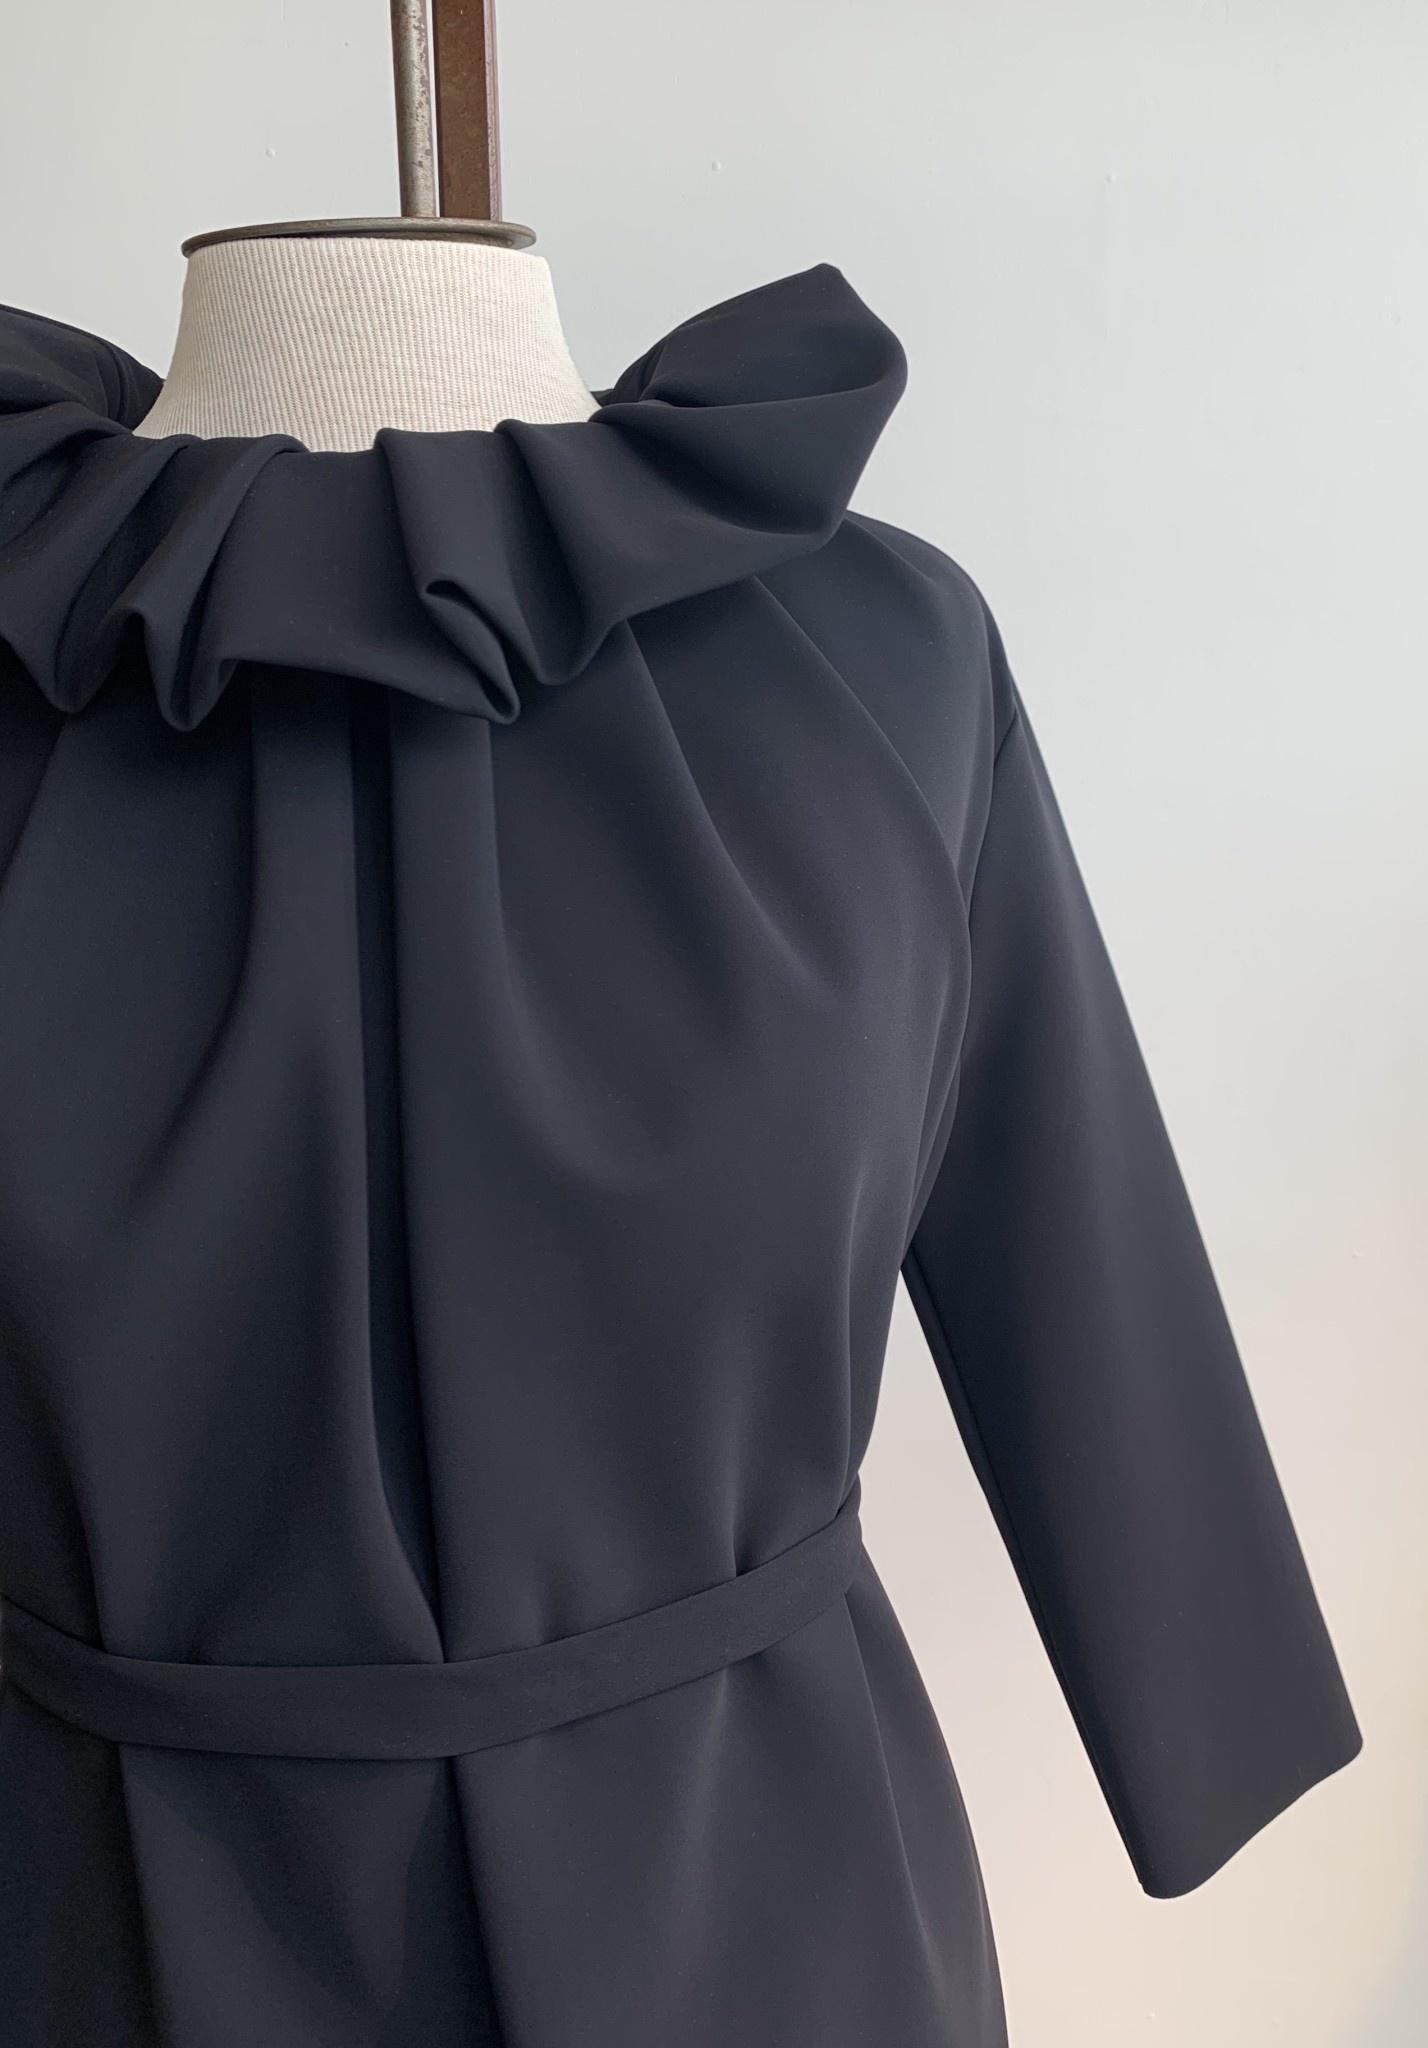 Greta Constantine Casper Dress